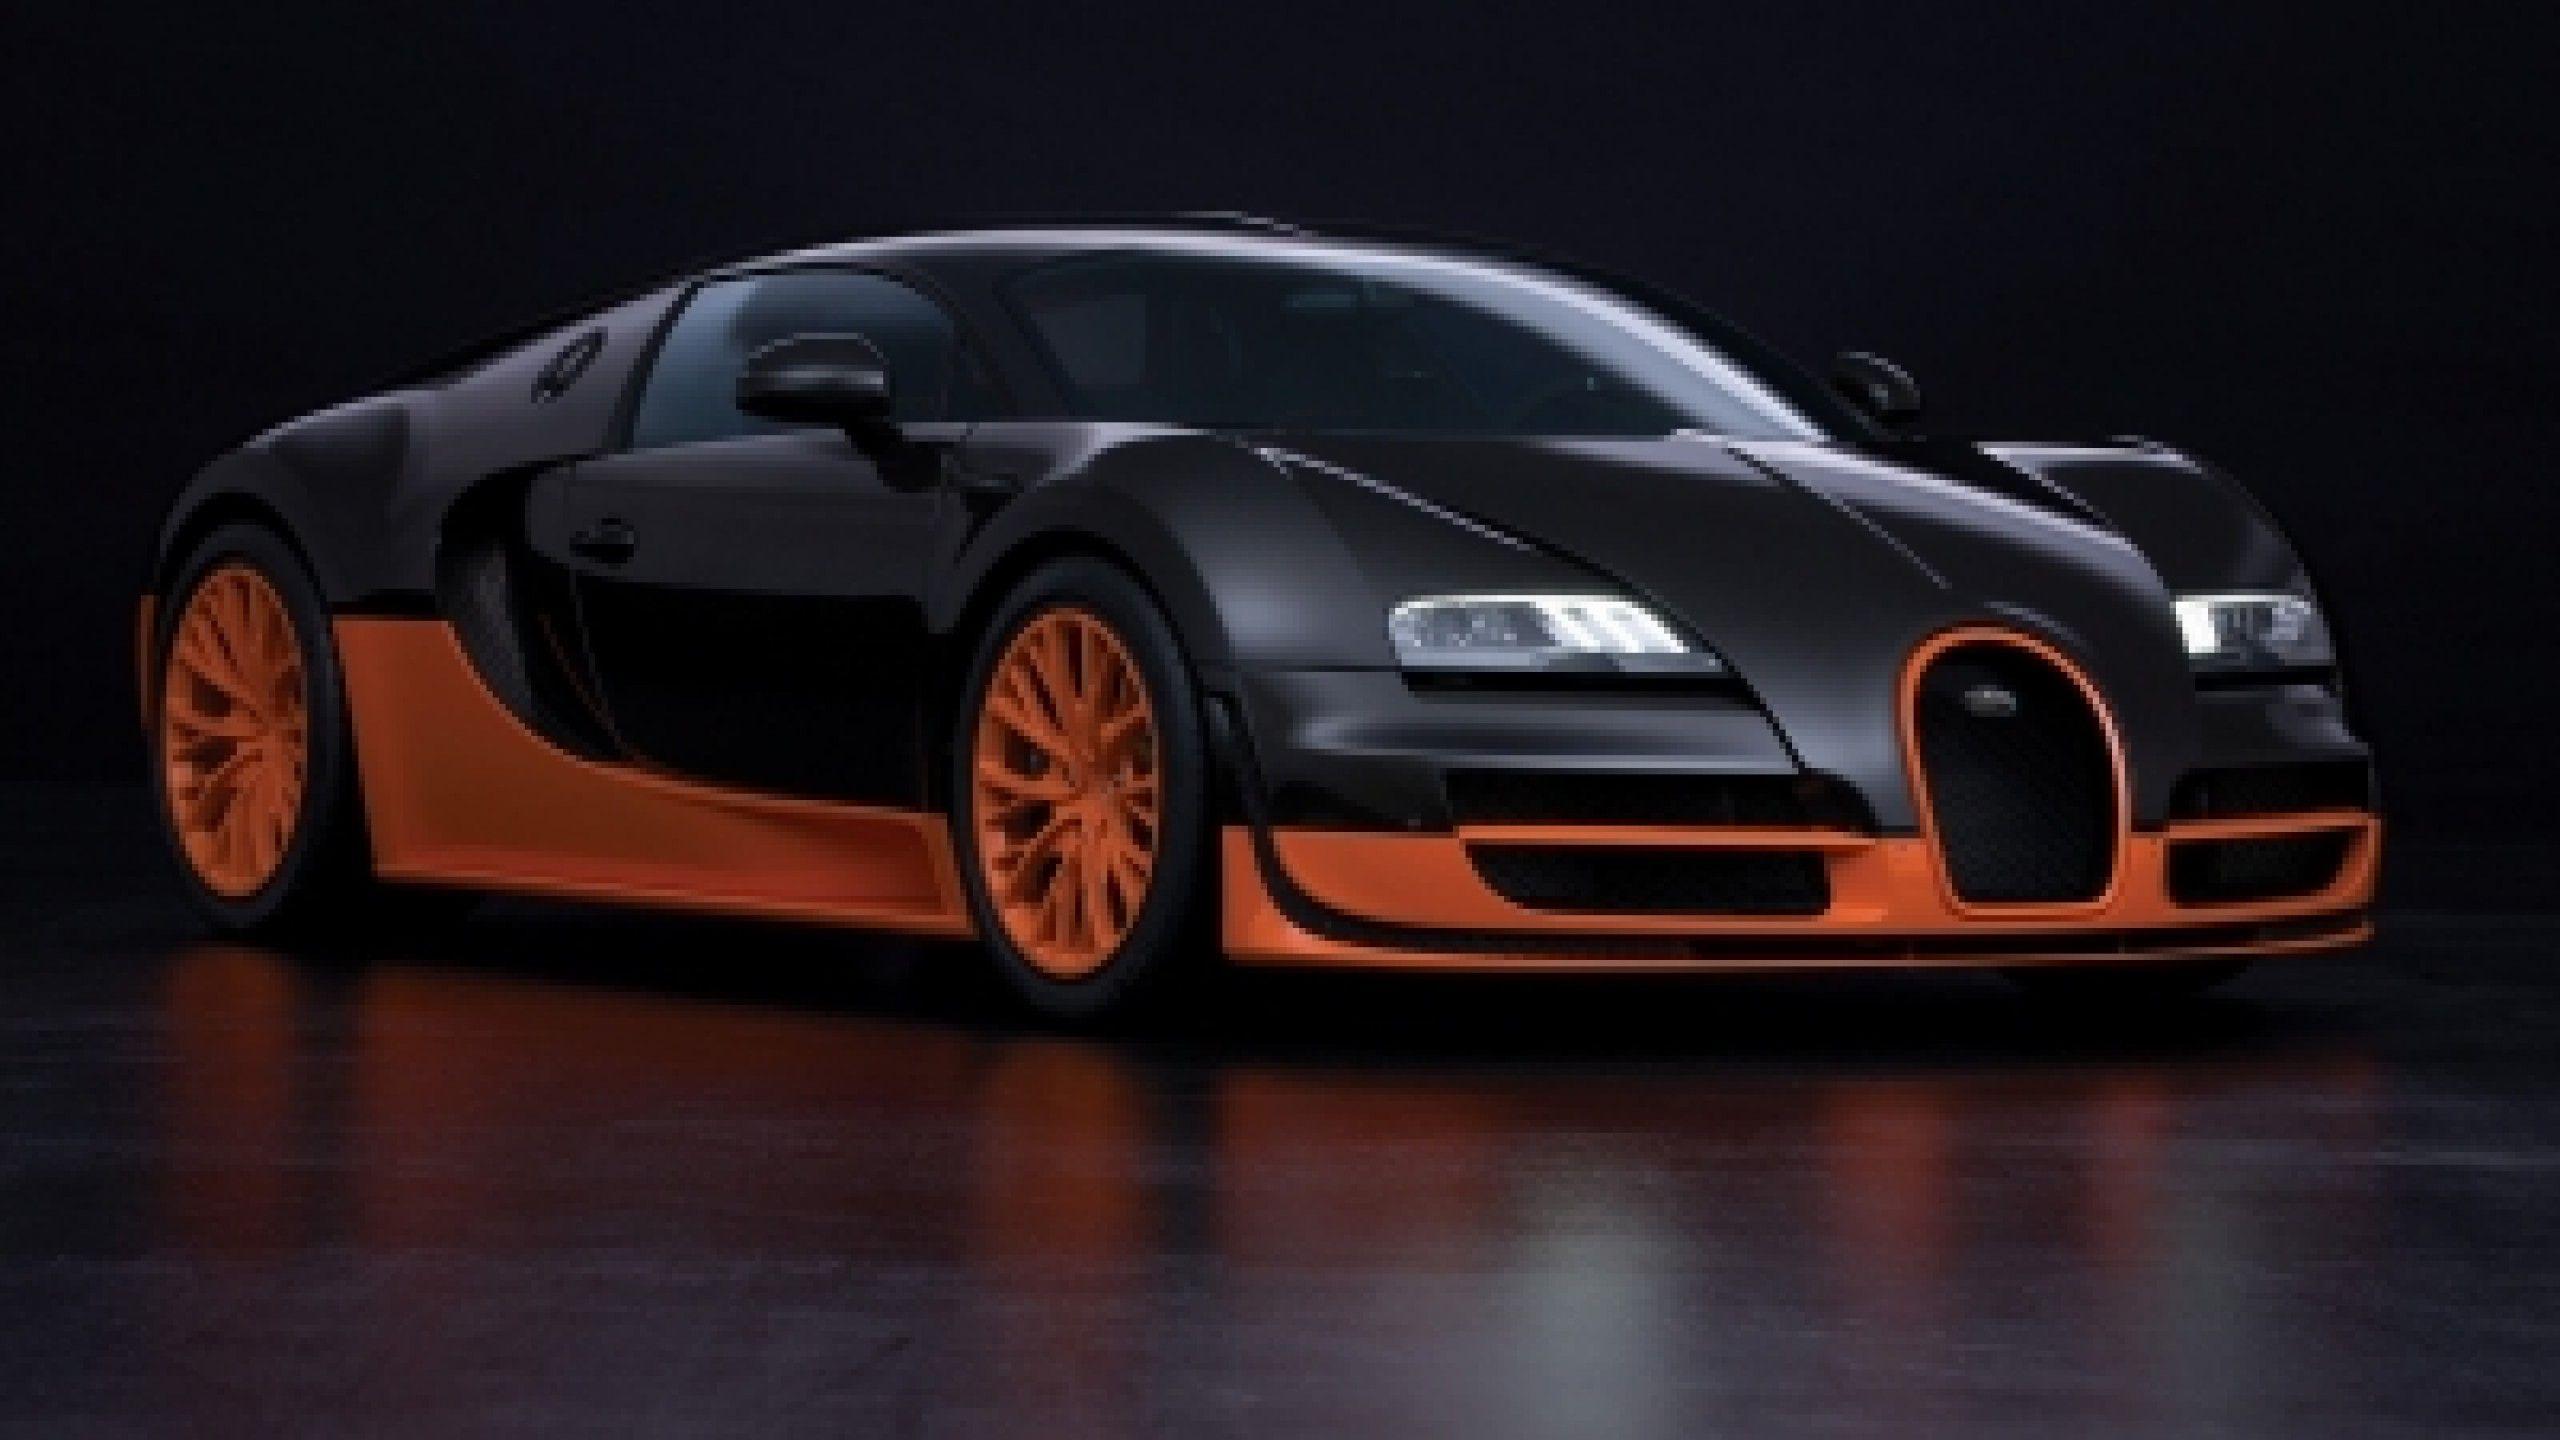 bugatti-veyron-super-sport-hd-wallpapers. http://nirhara.com/category/wallpapers/car